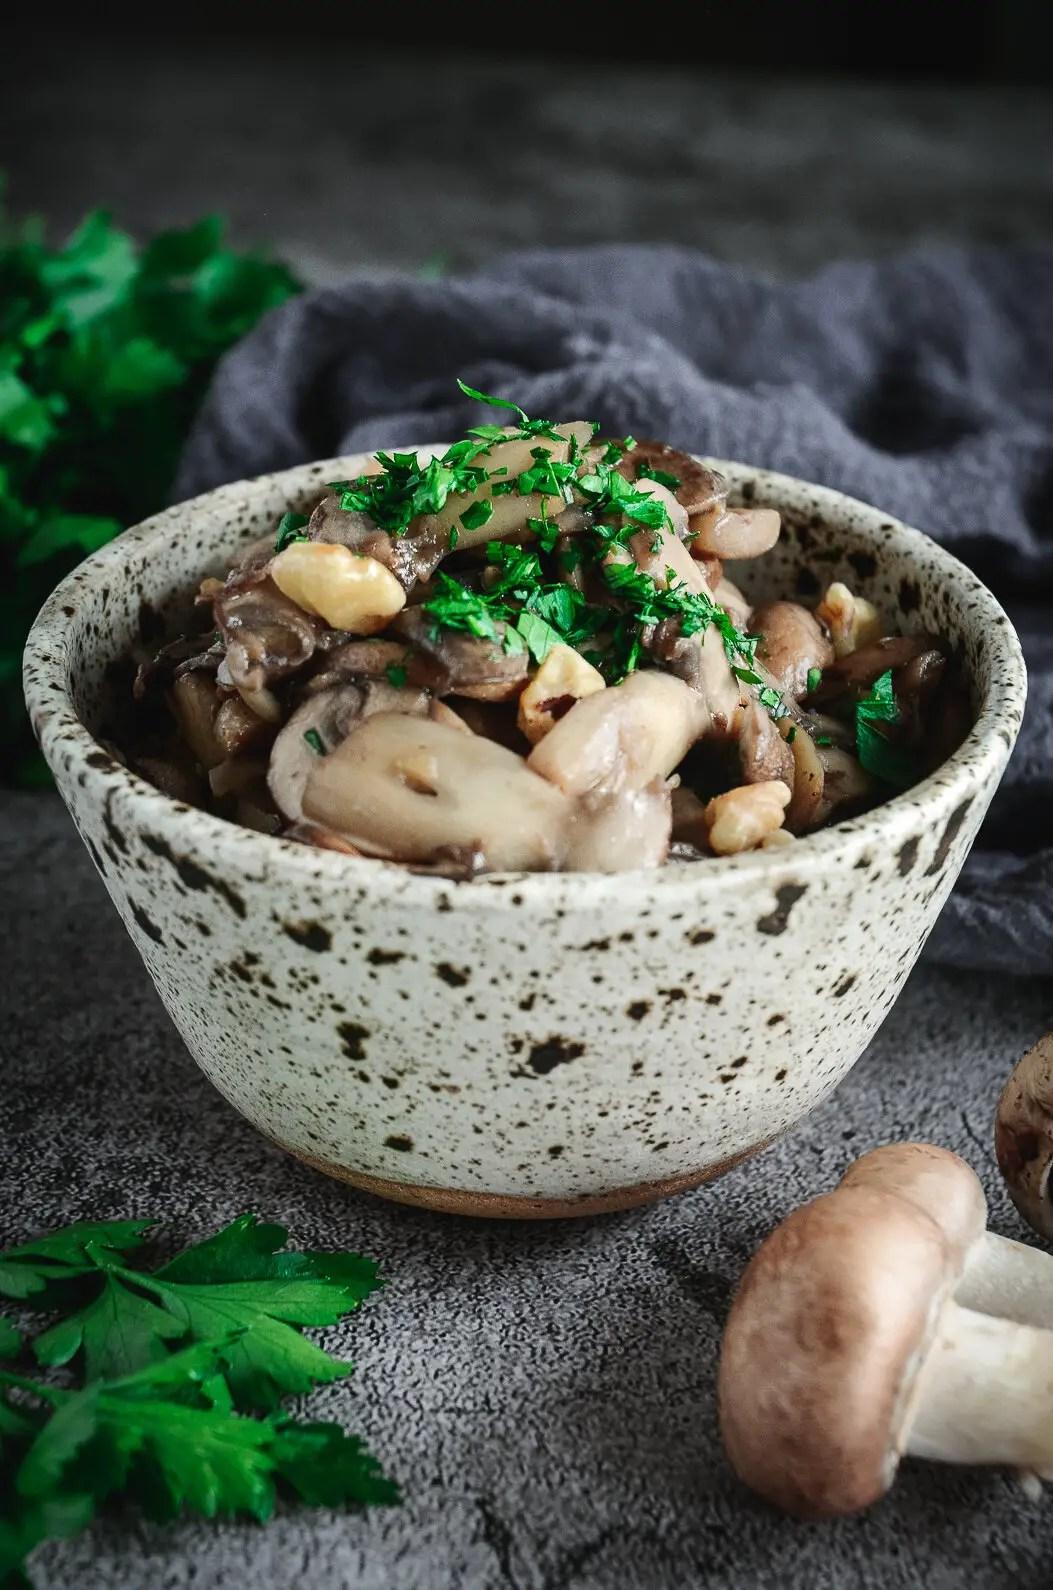 Sautéed Muhsrooms in bowl